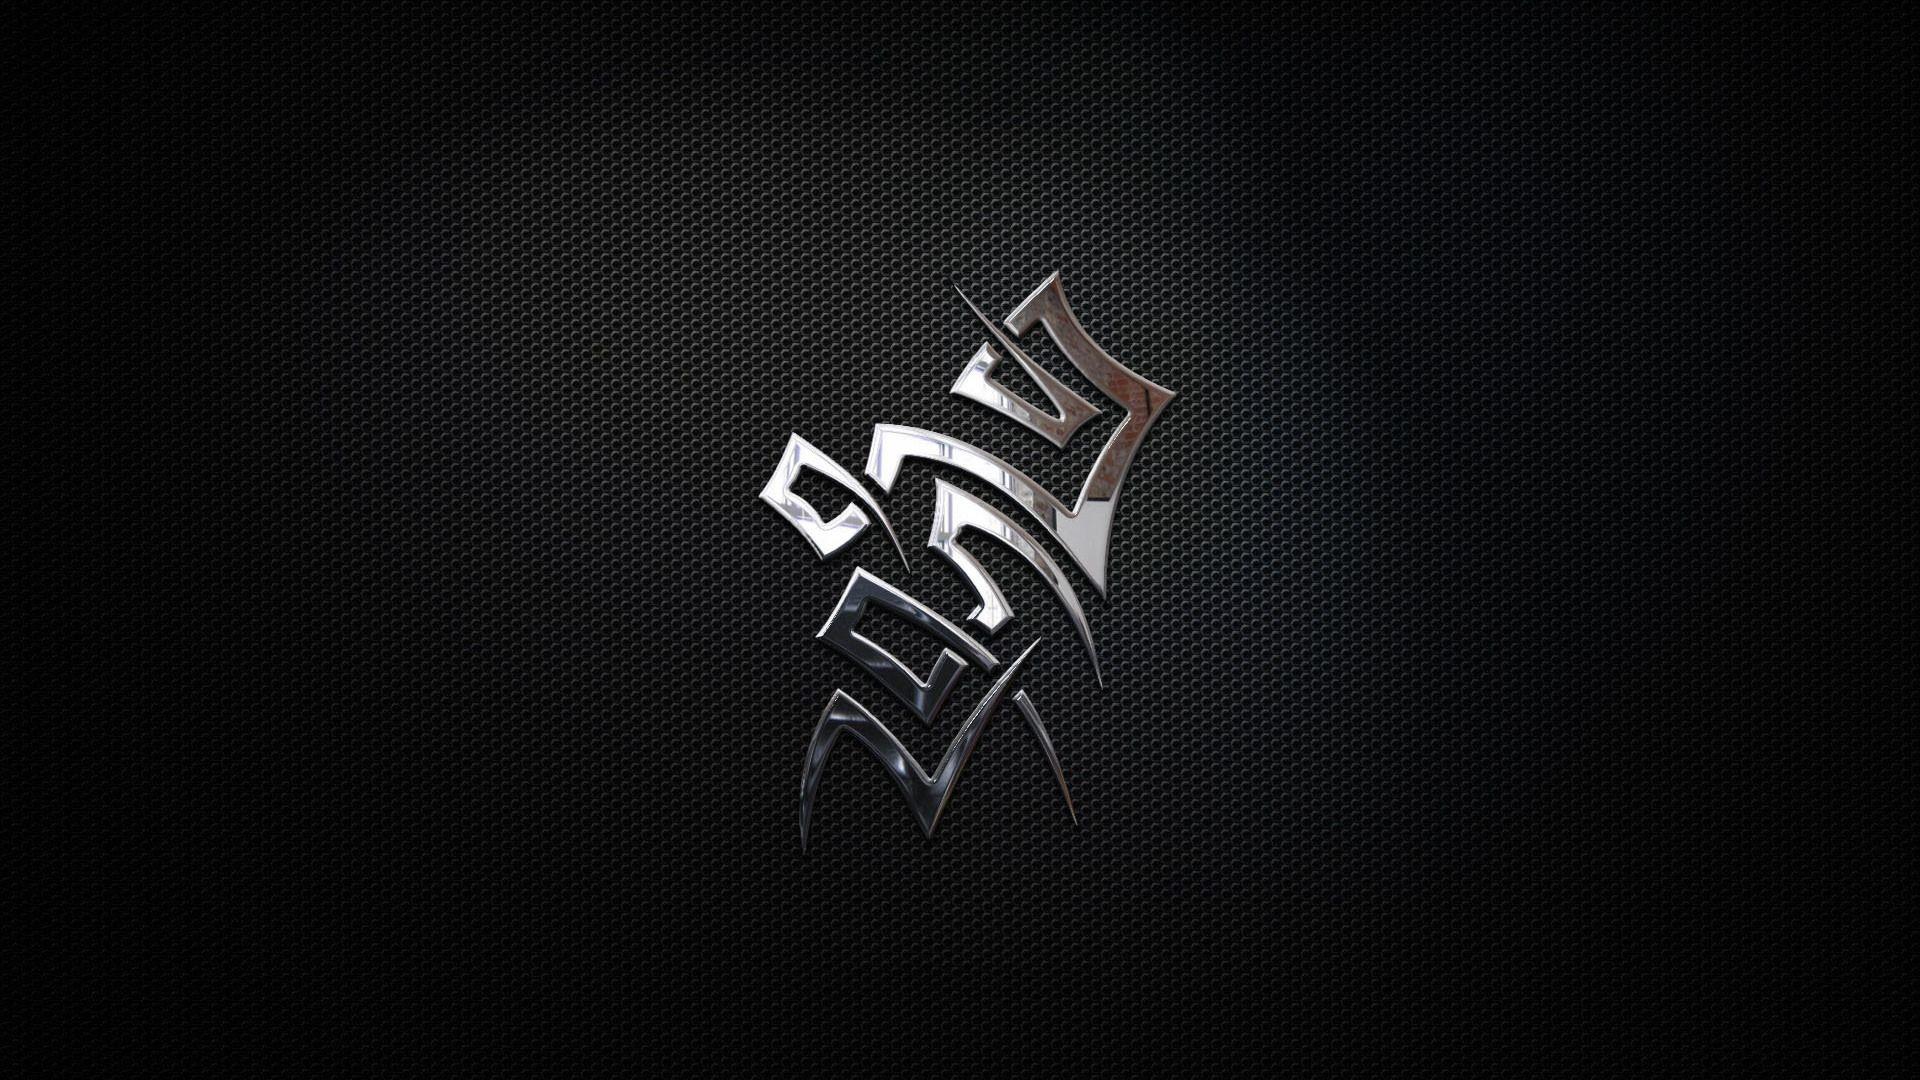 … Black Wallpaper 1080p. Download